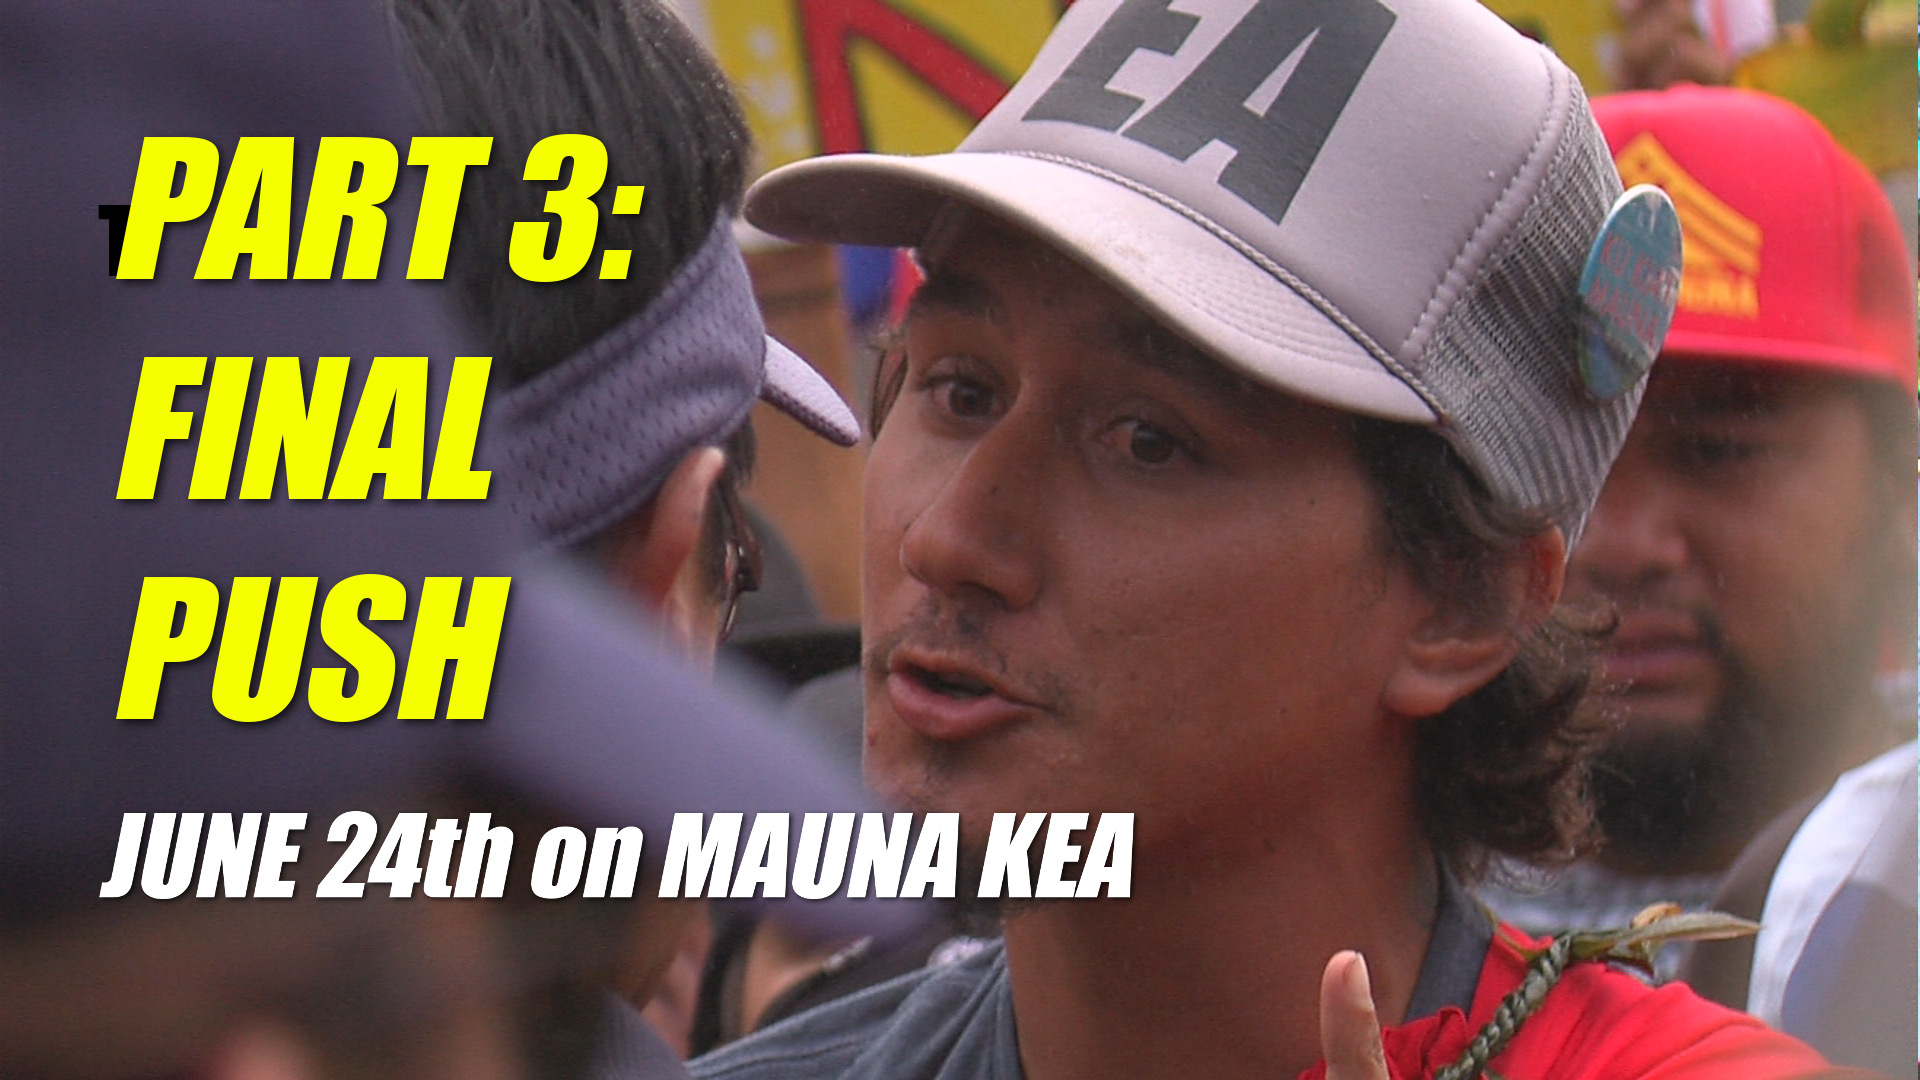 VIDEO: Mauna Kea TMT Showdown – Part 3 of 3